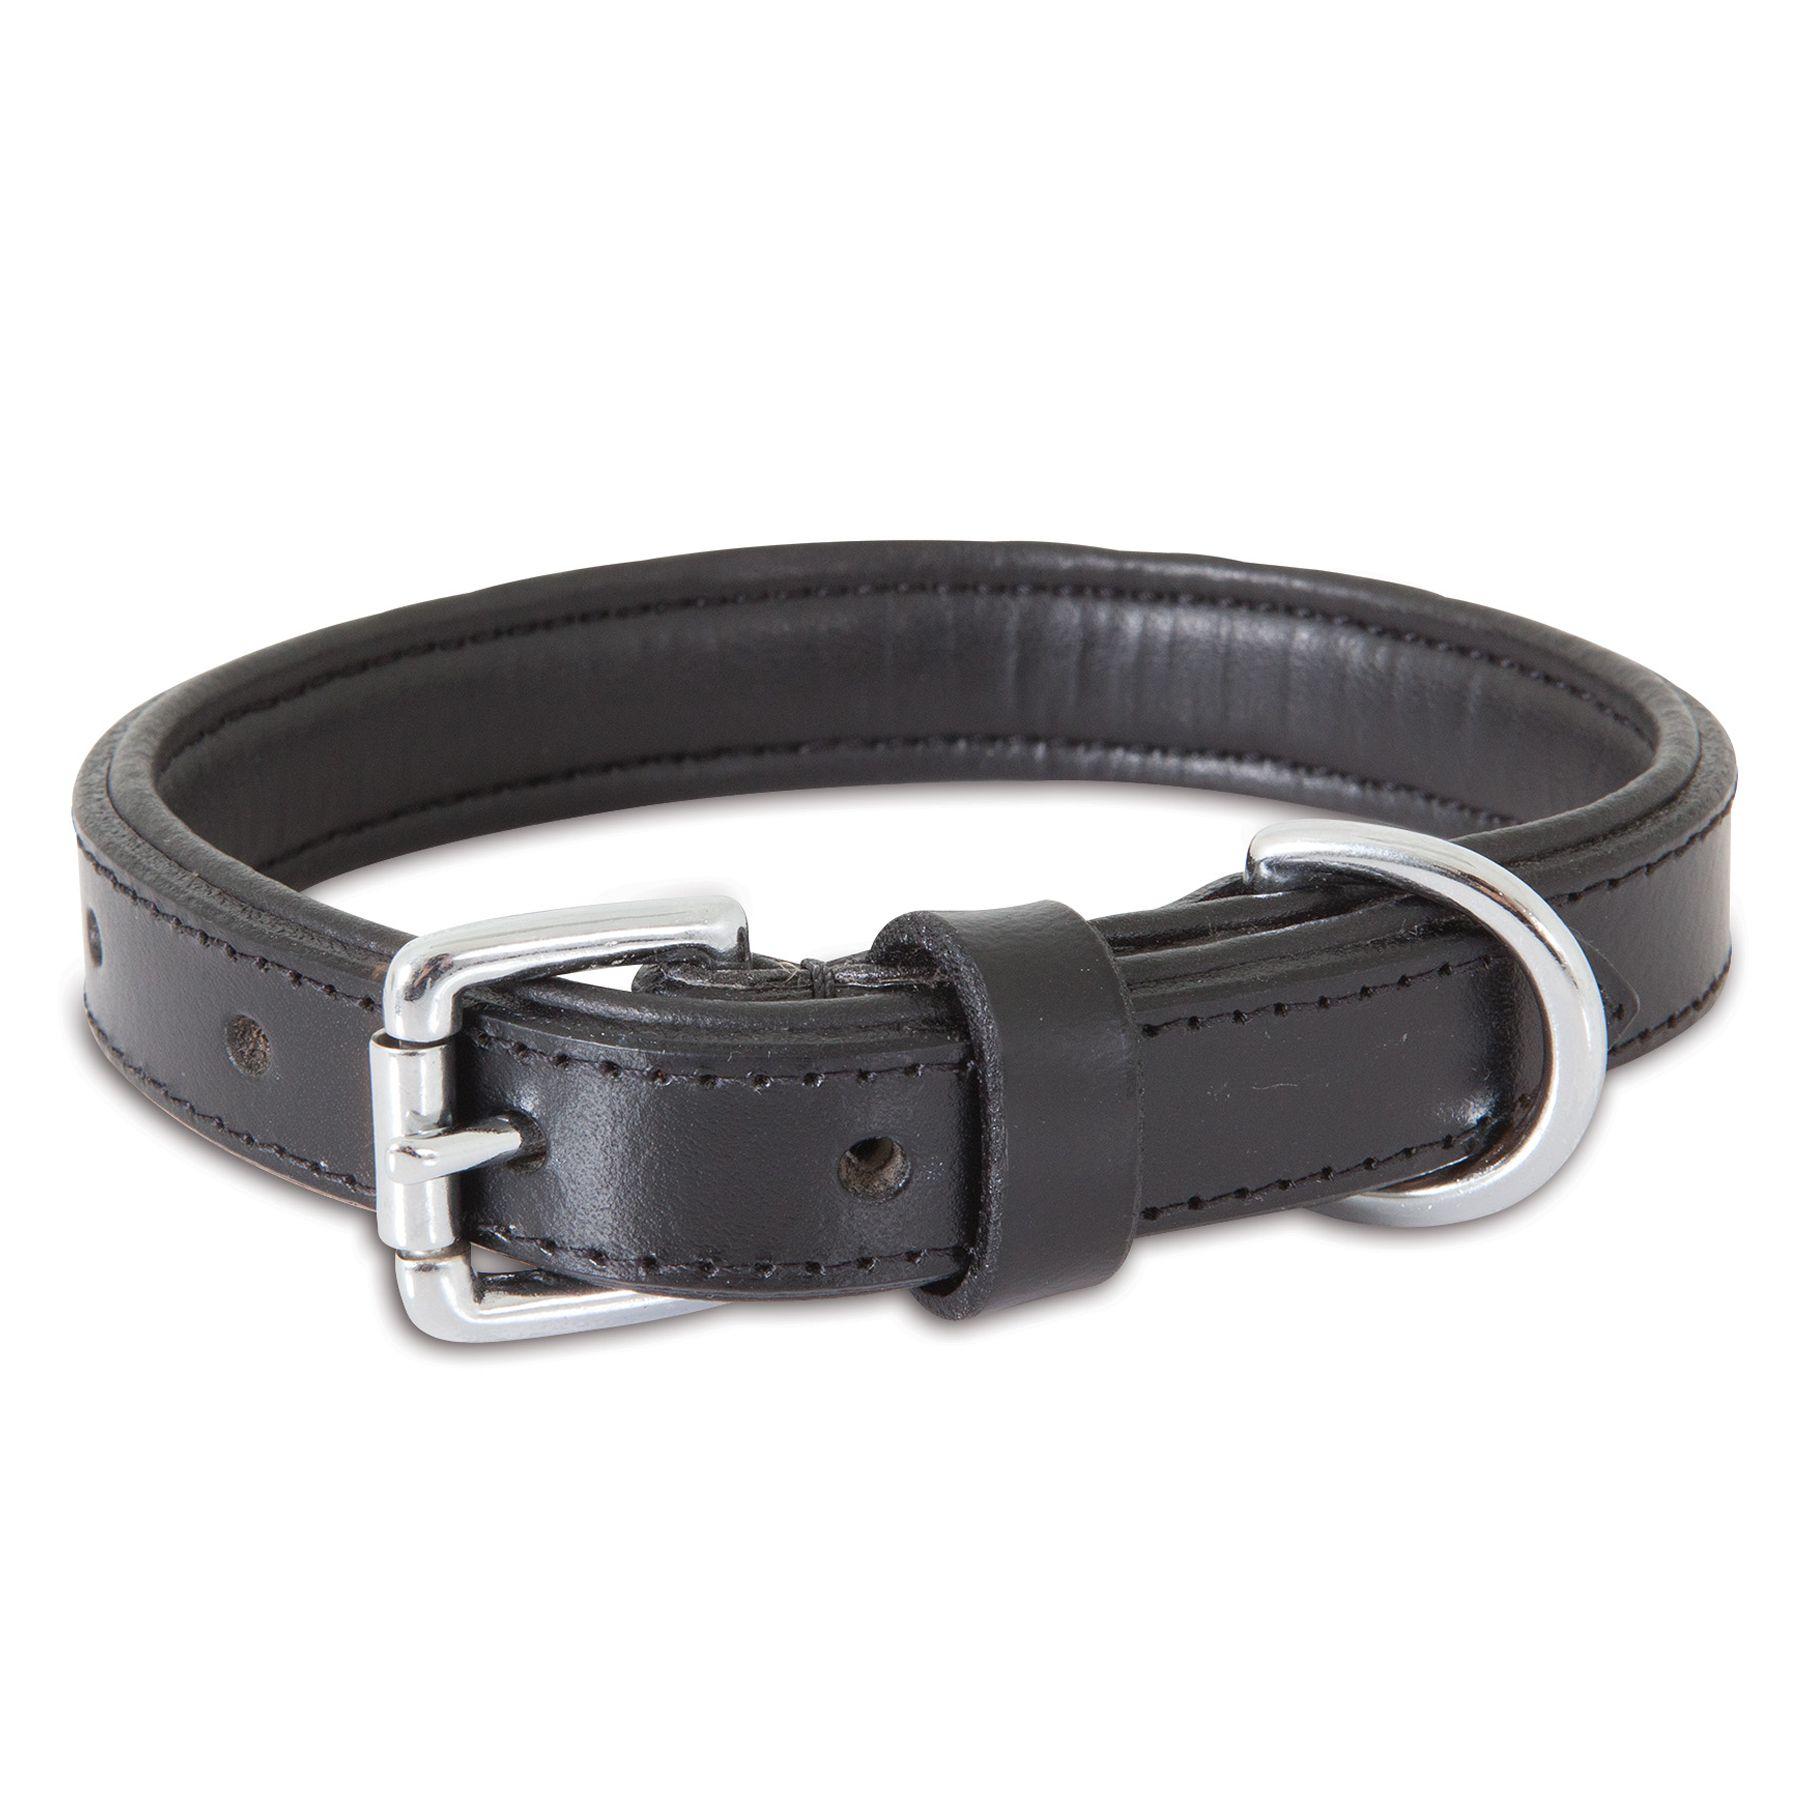 "Petmate Leather Dog Collar size: 18""L x 1""W, Black 5202131"